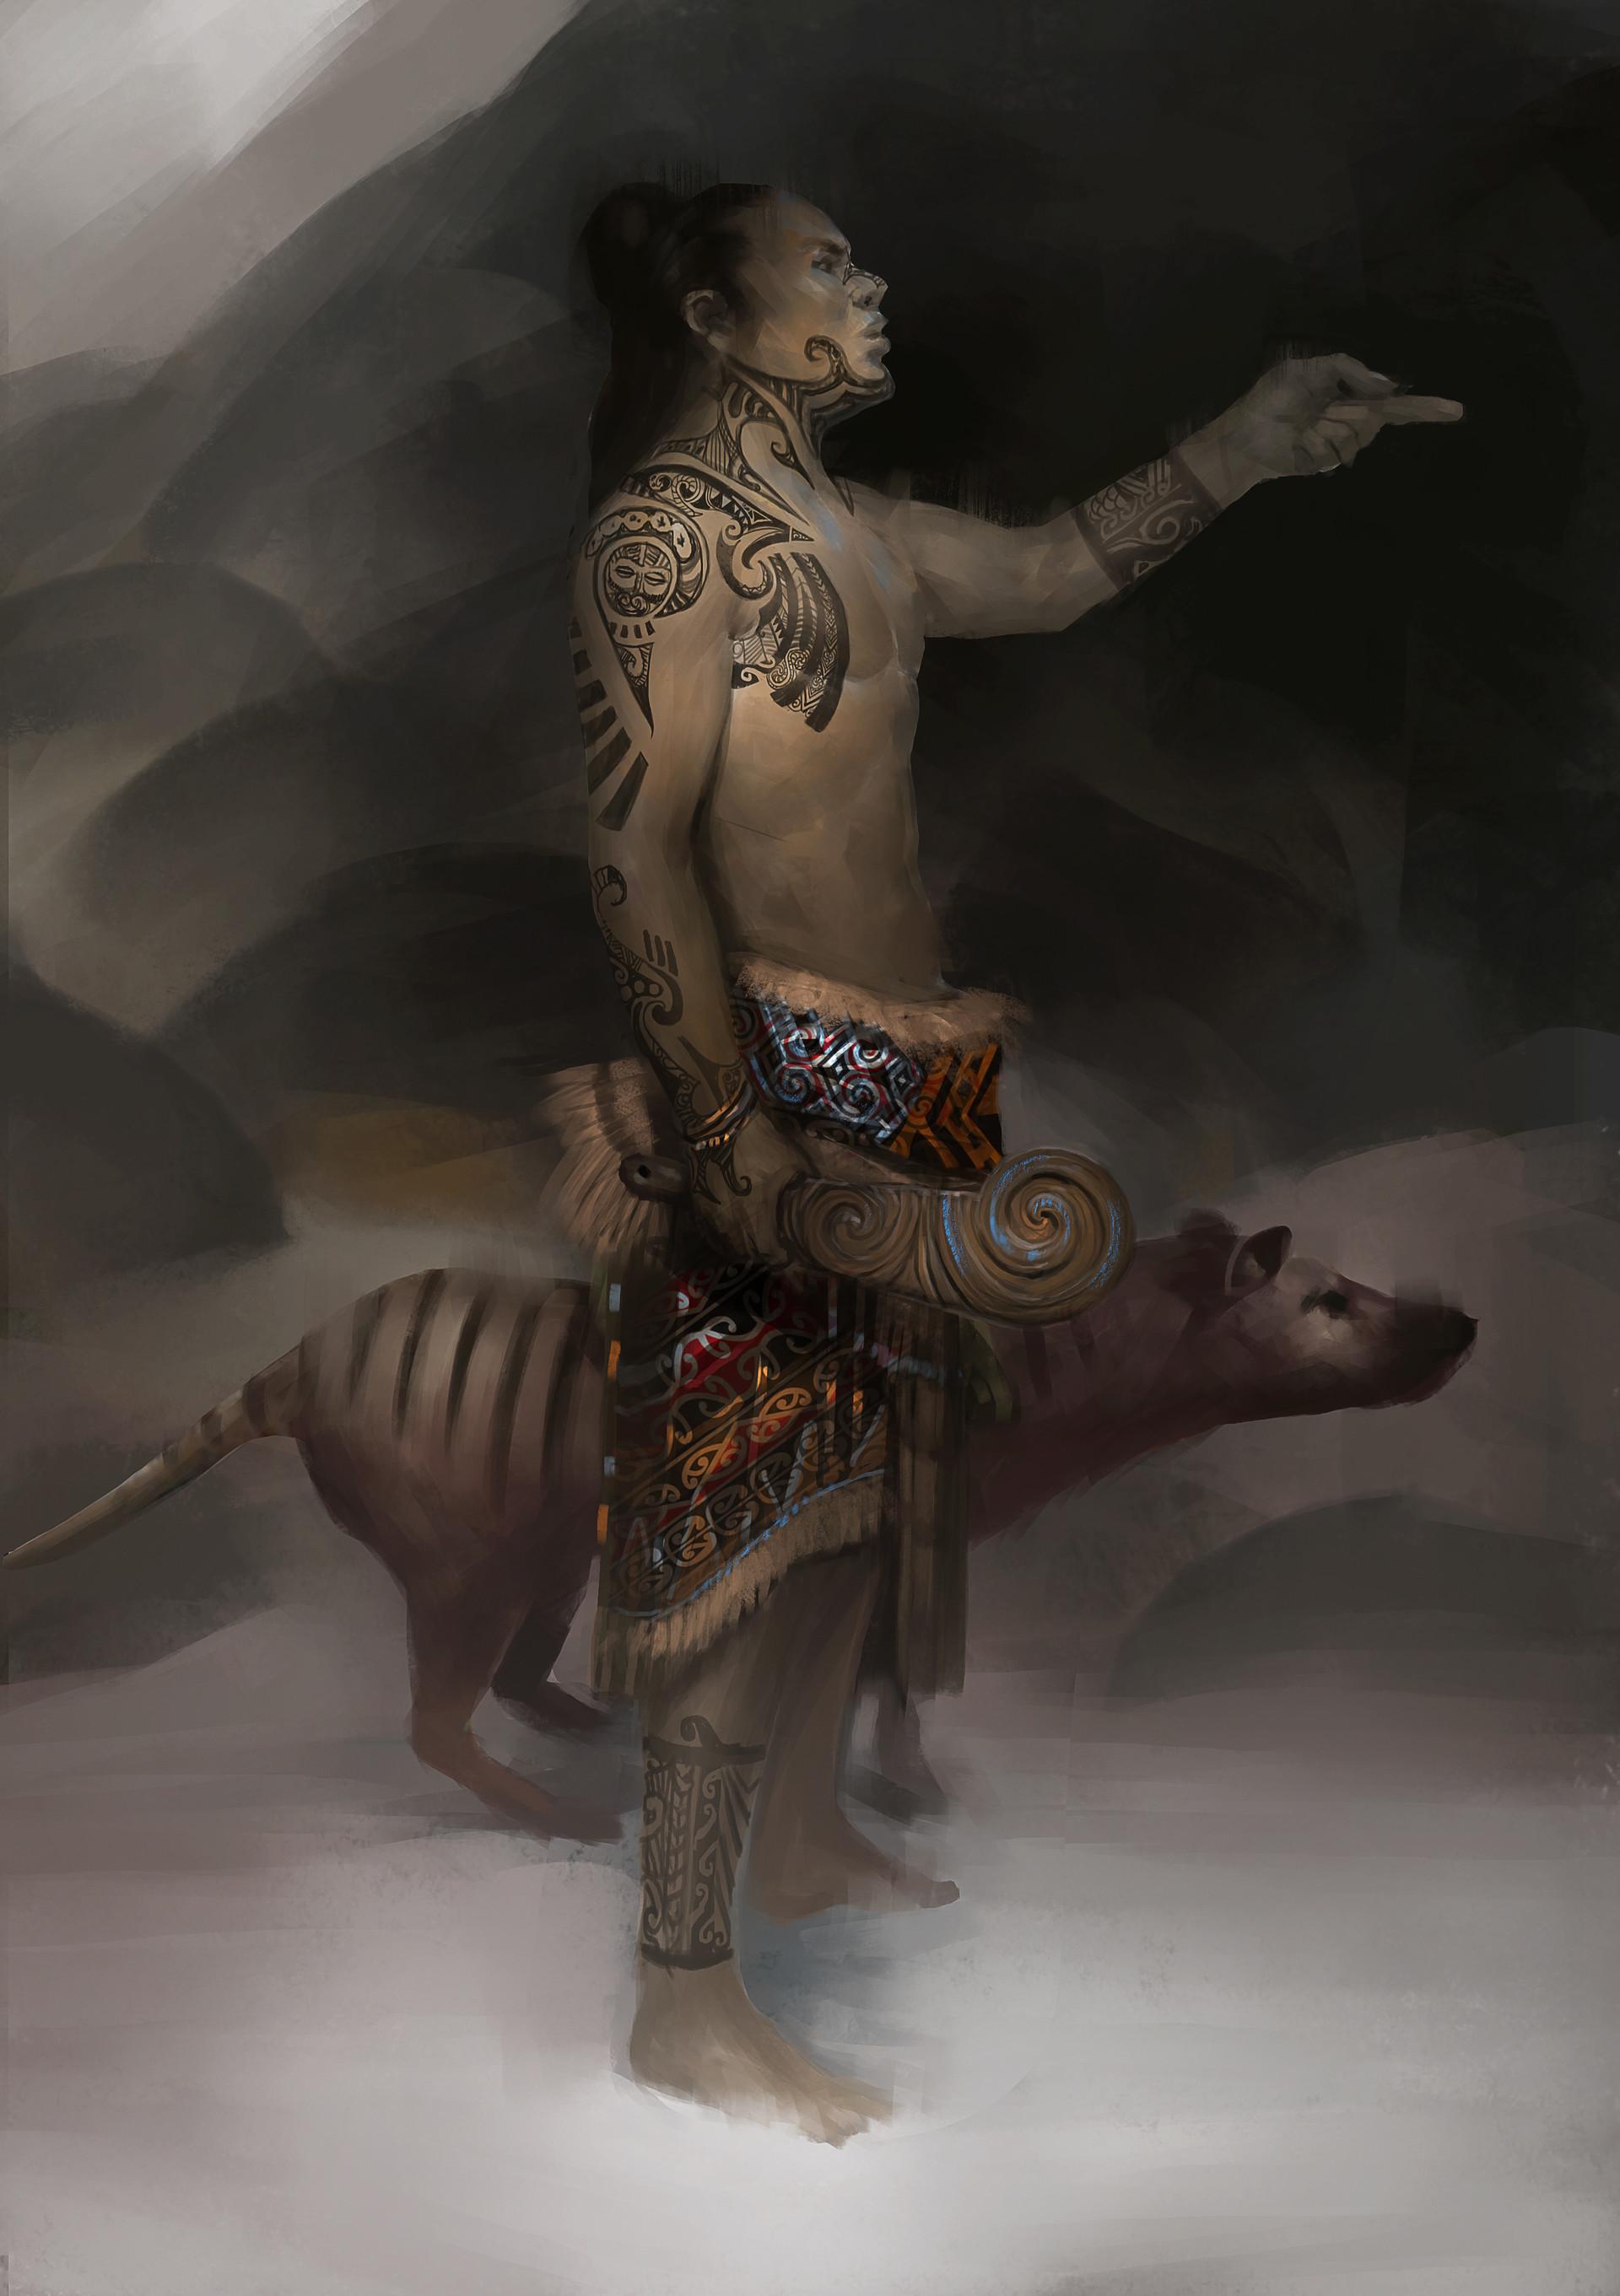 Pierre raveneau mine field maori